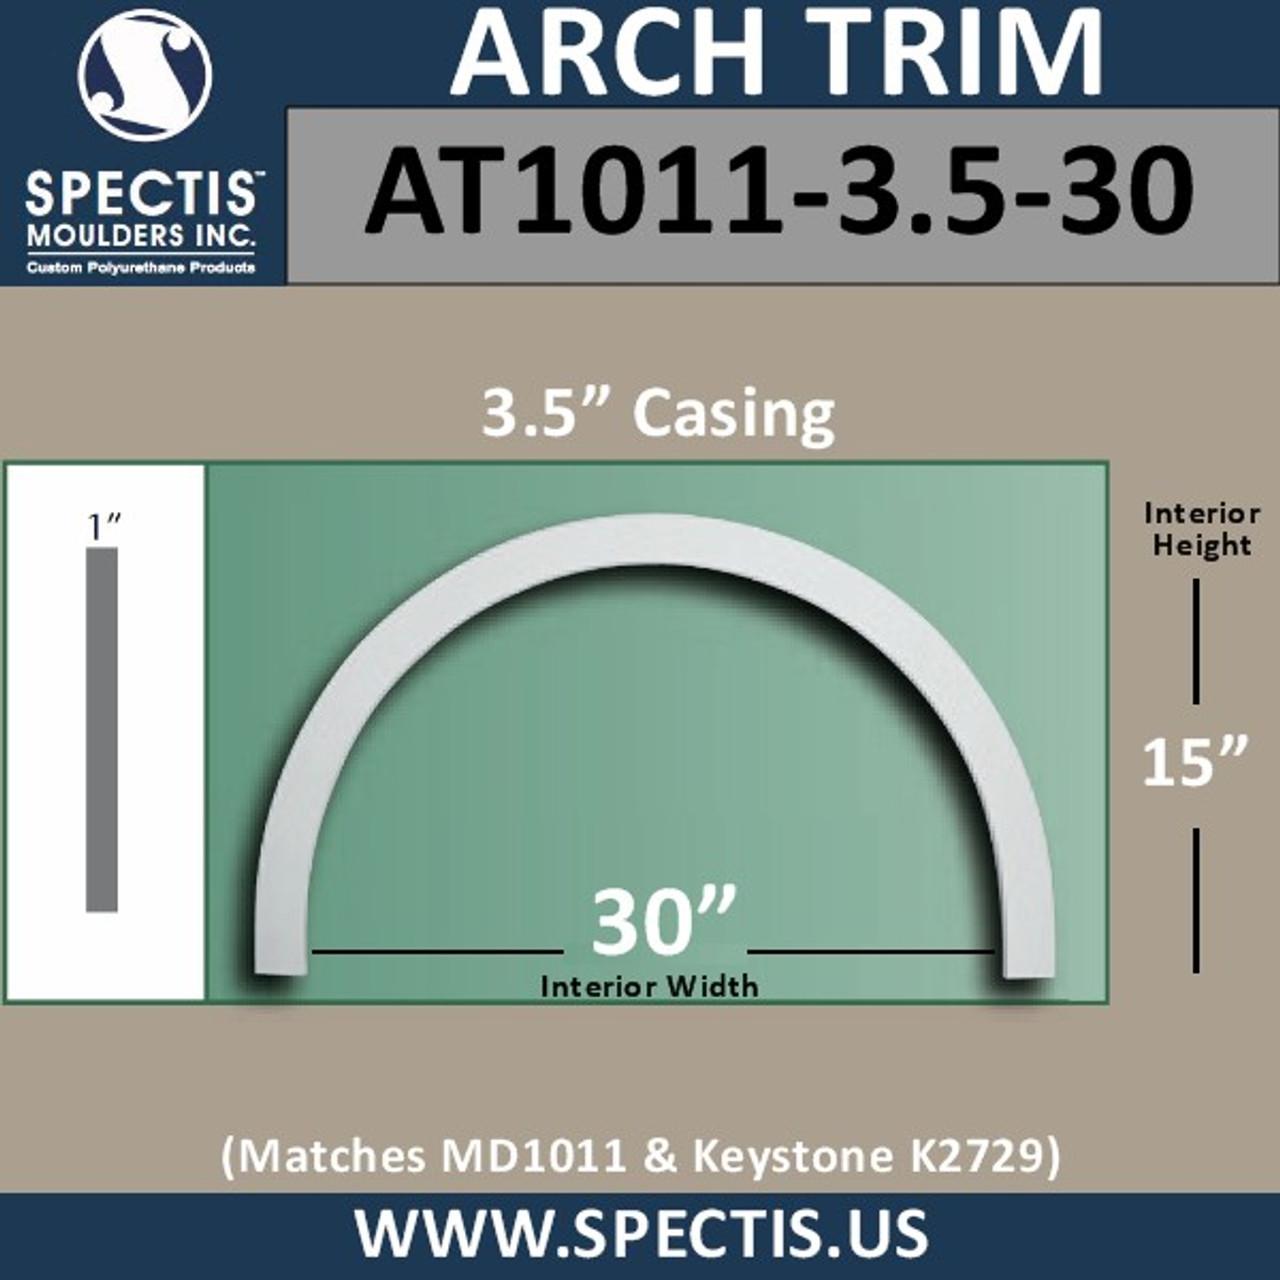 "AT1011-3.5-30 Flat Trim Urethane Door or Window Arch 30"" ID"